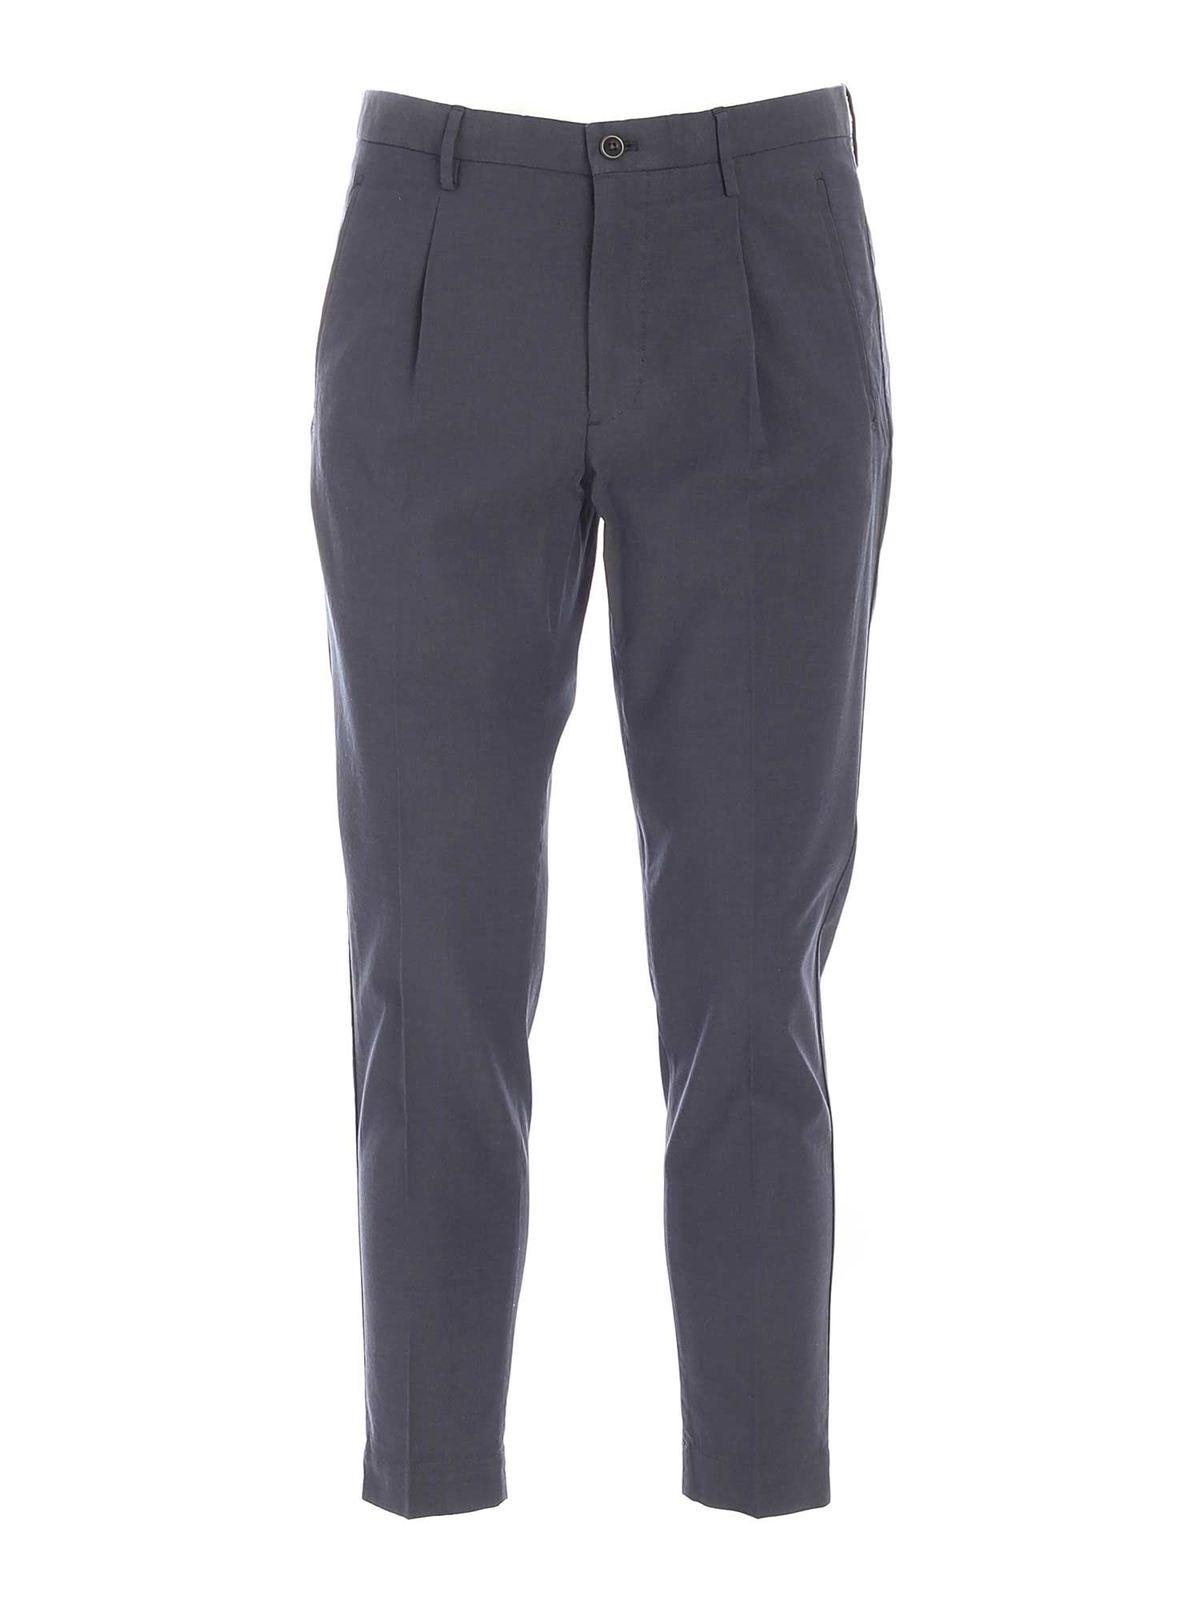 Incotex Tucks Pants In Melange Blue